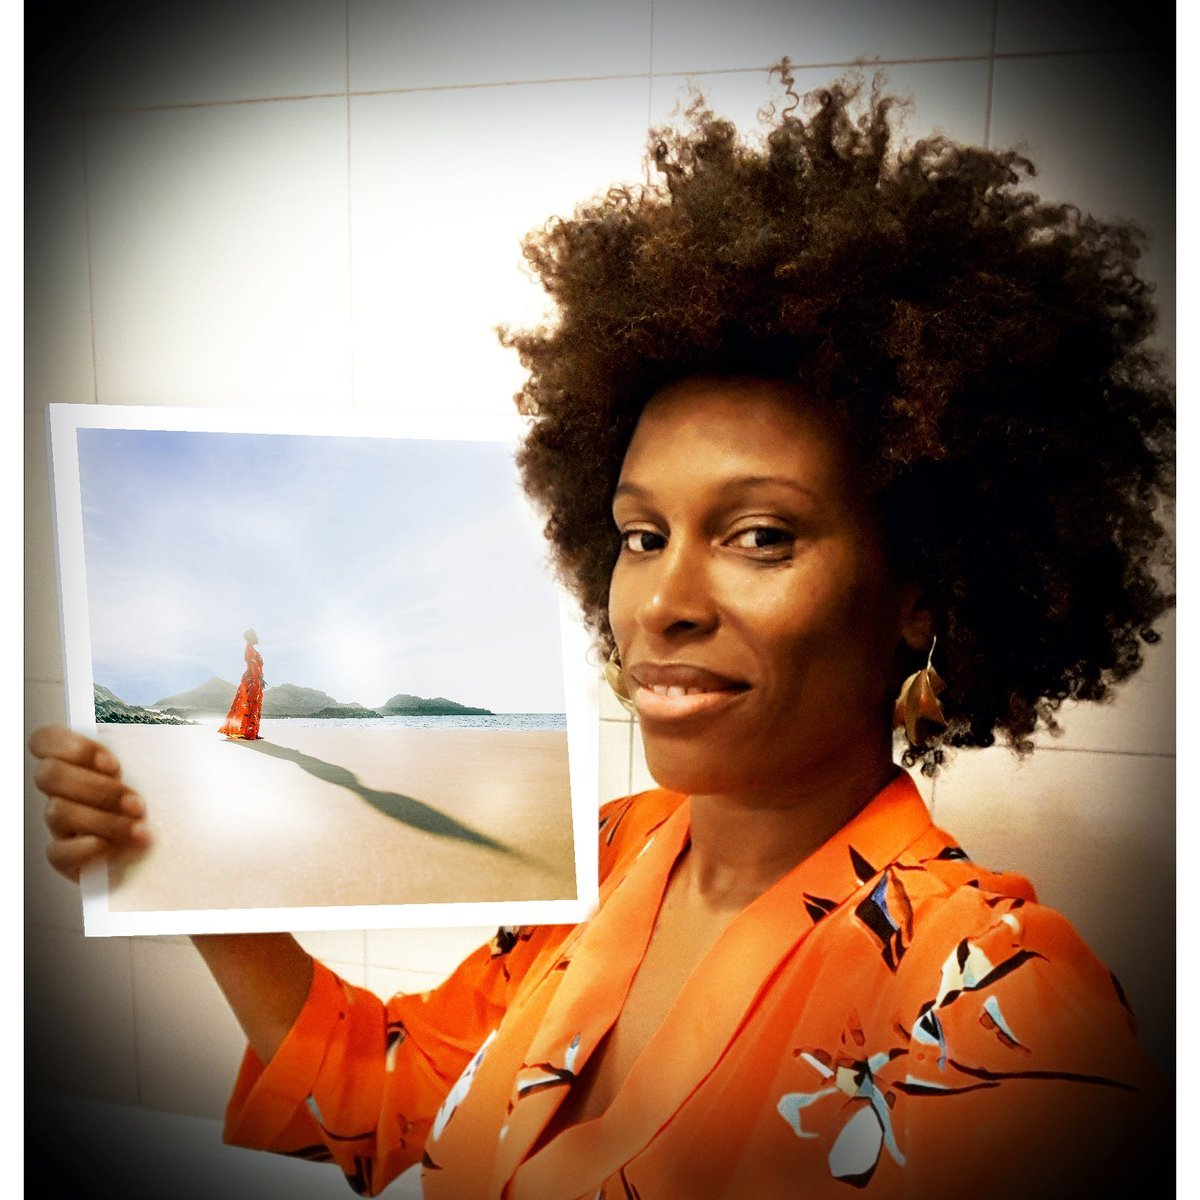 sandra nkaké aeronef lille tangerine moon wishes album tournée cacestculte jazz village